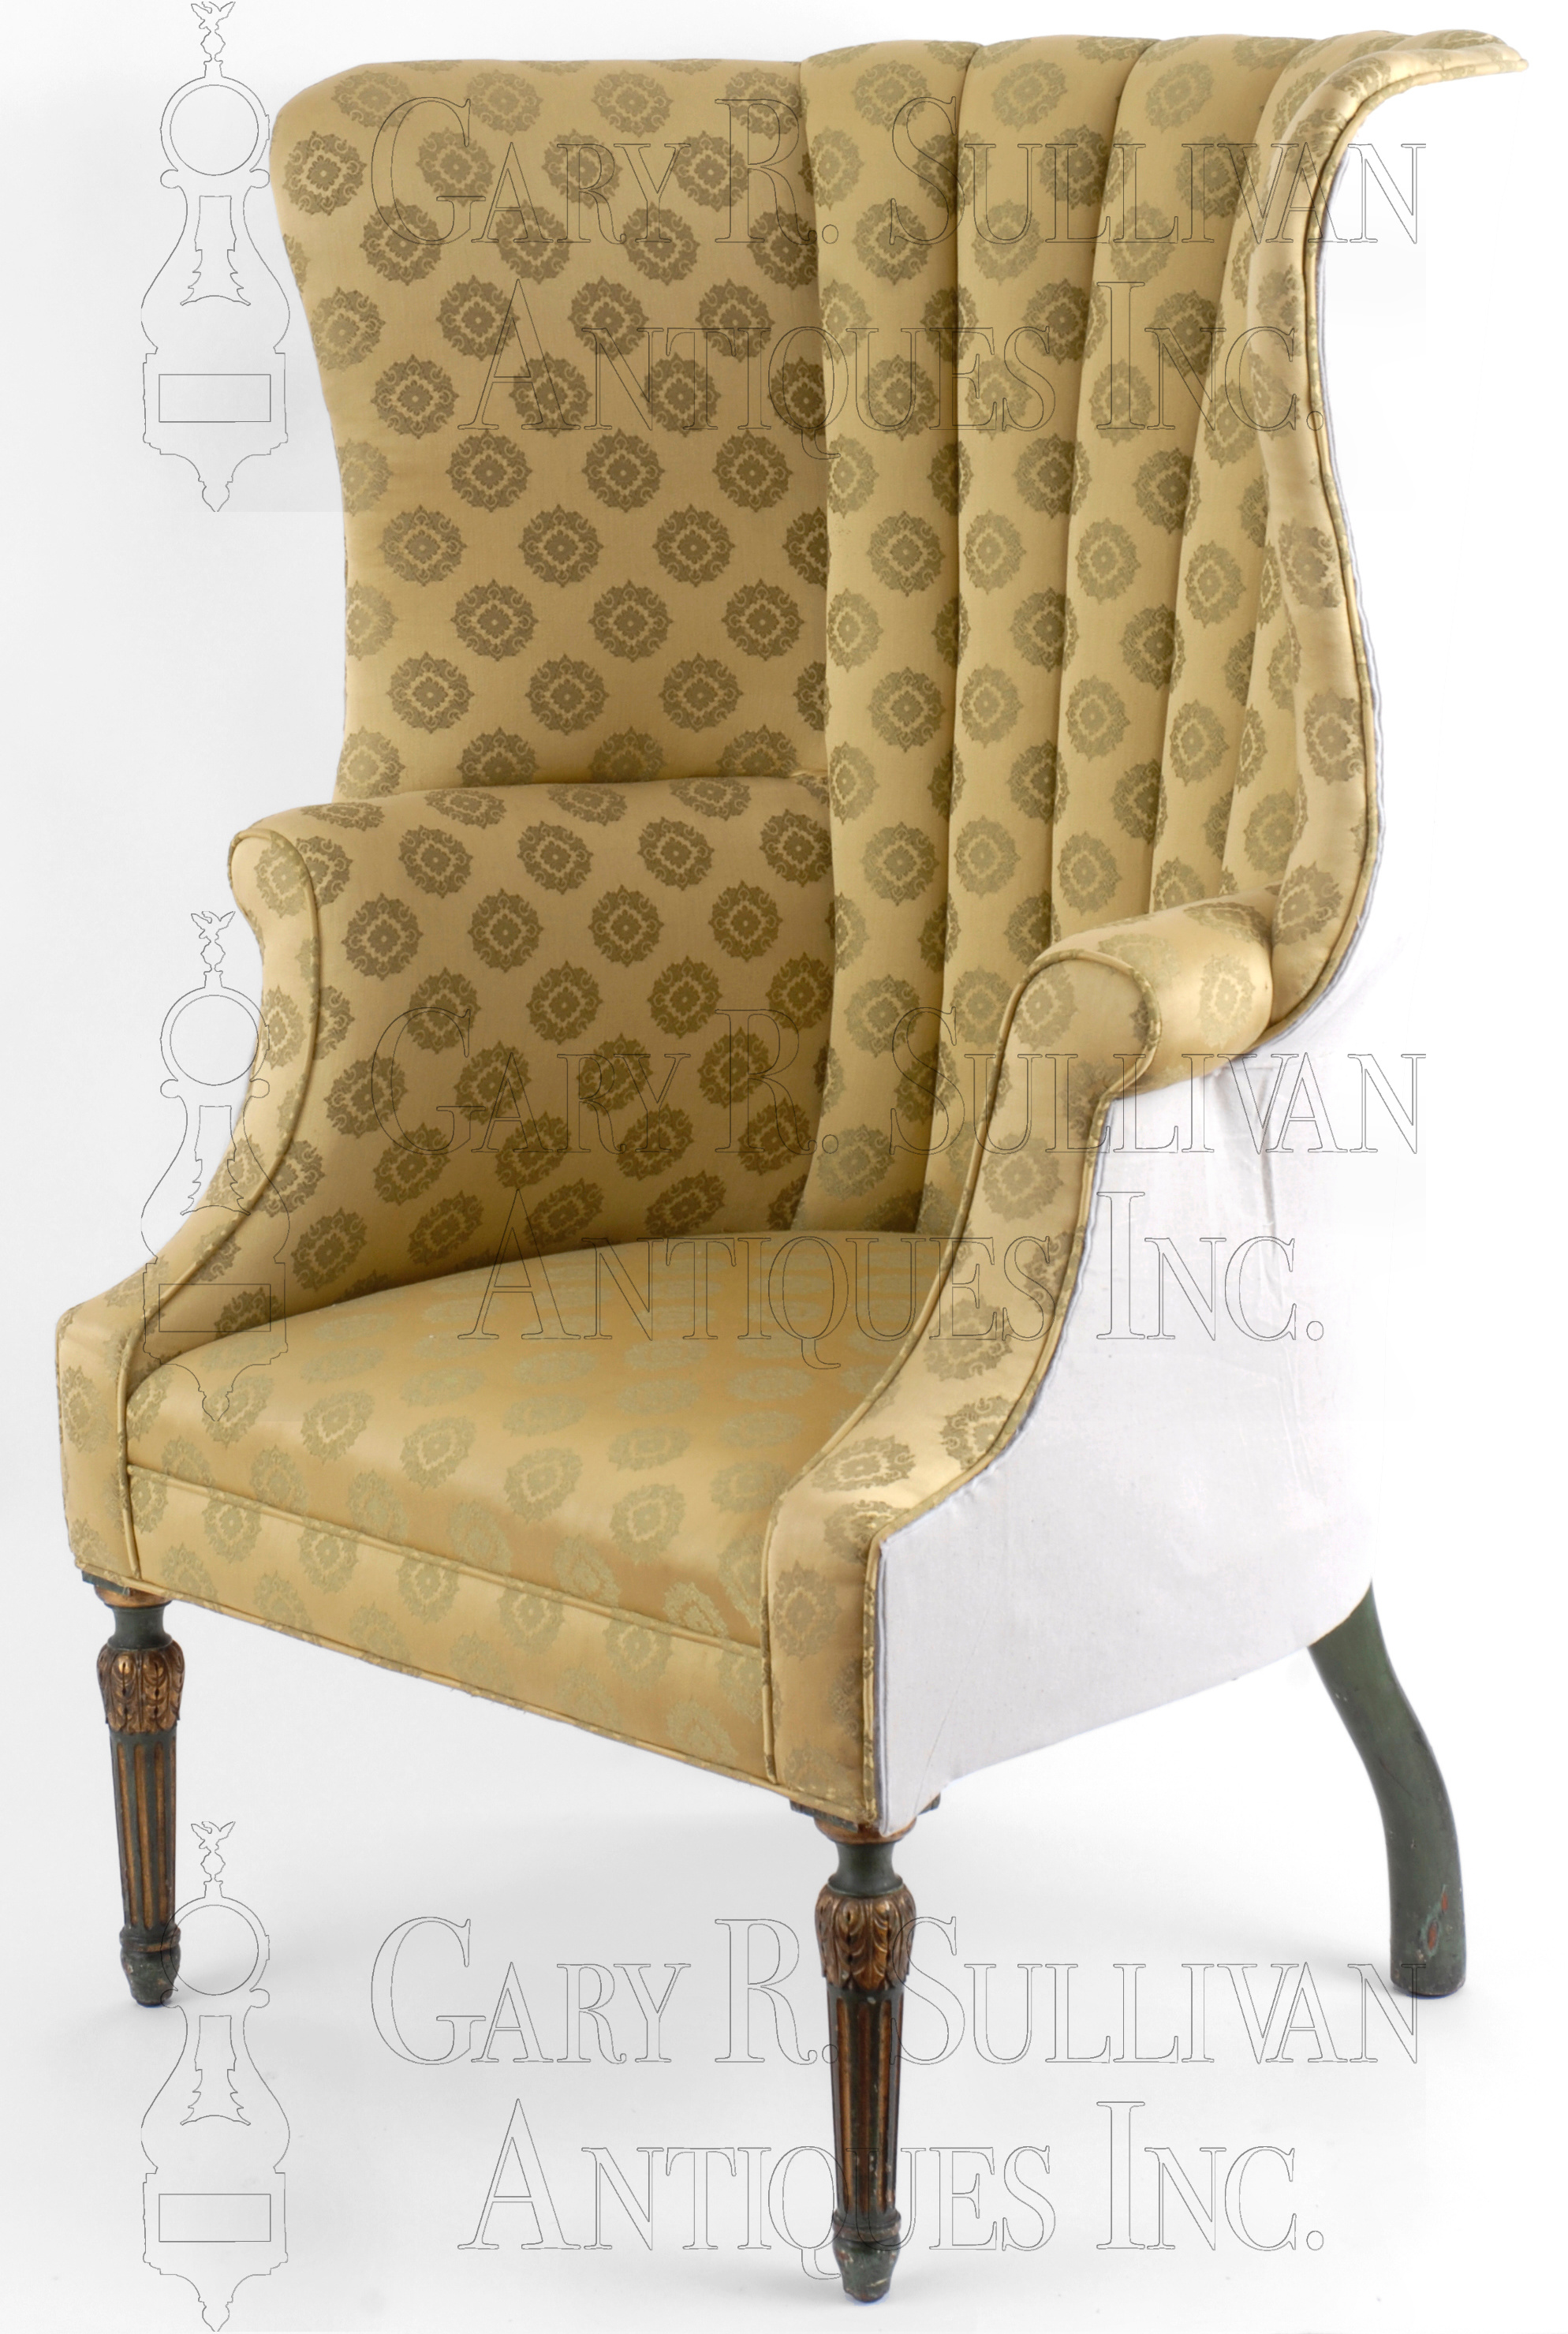 barrel back chair desk mat 36 x 48 easy philadelphia pa clocks 08045 gary view in browser